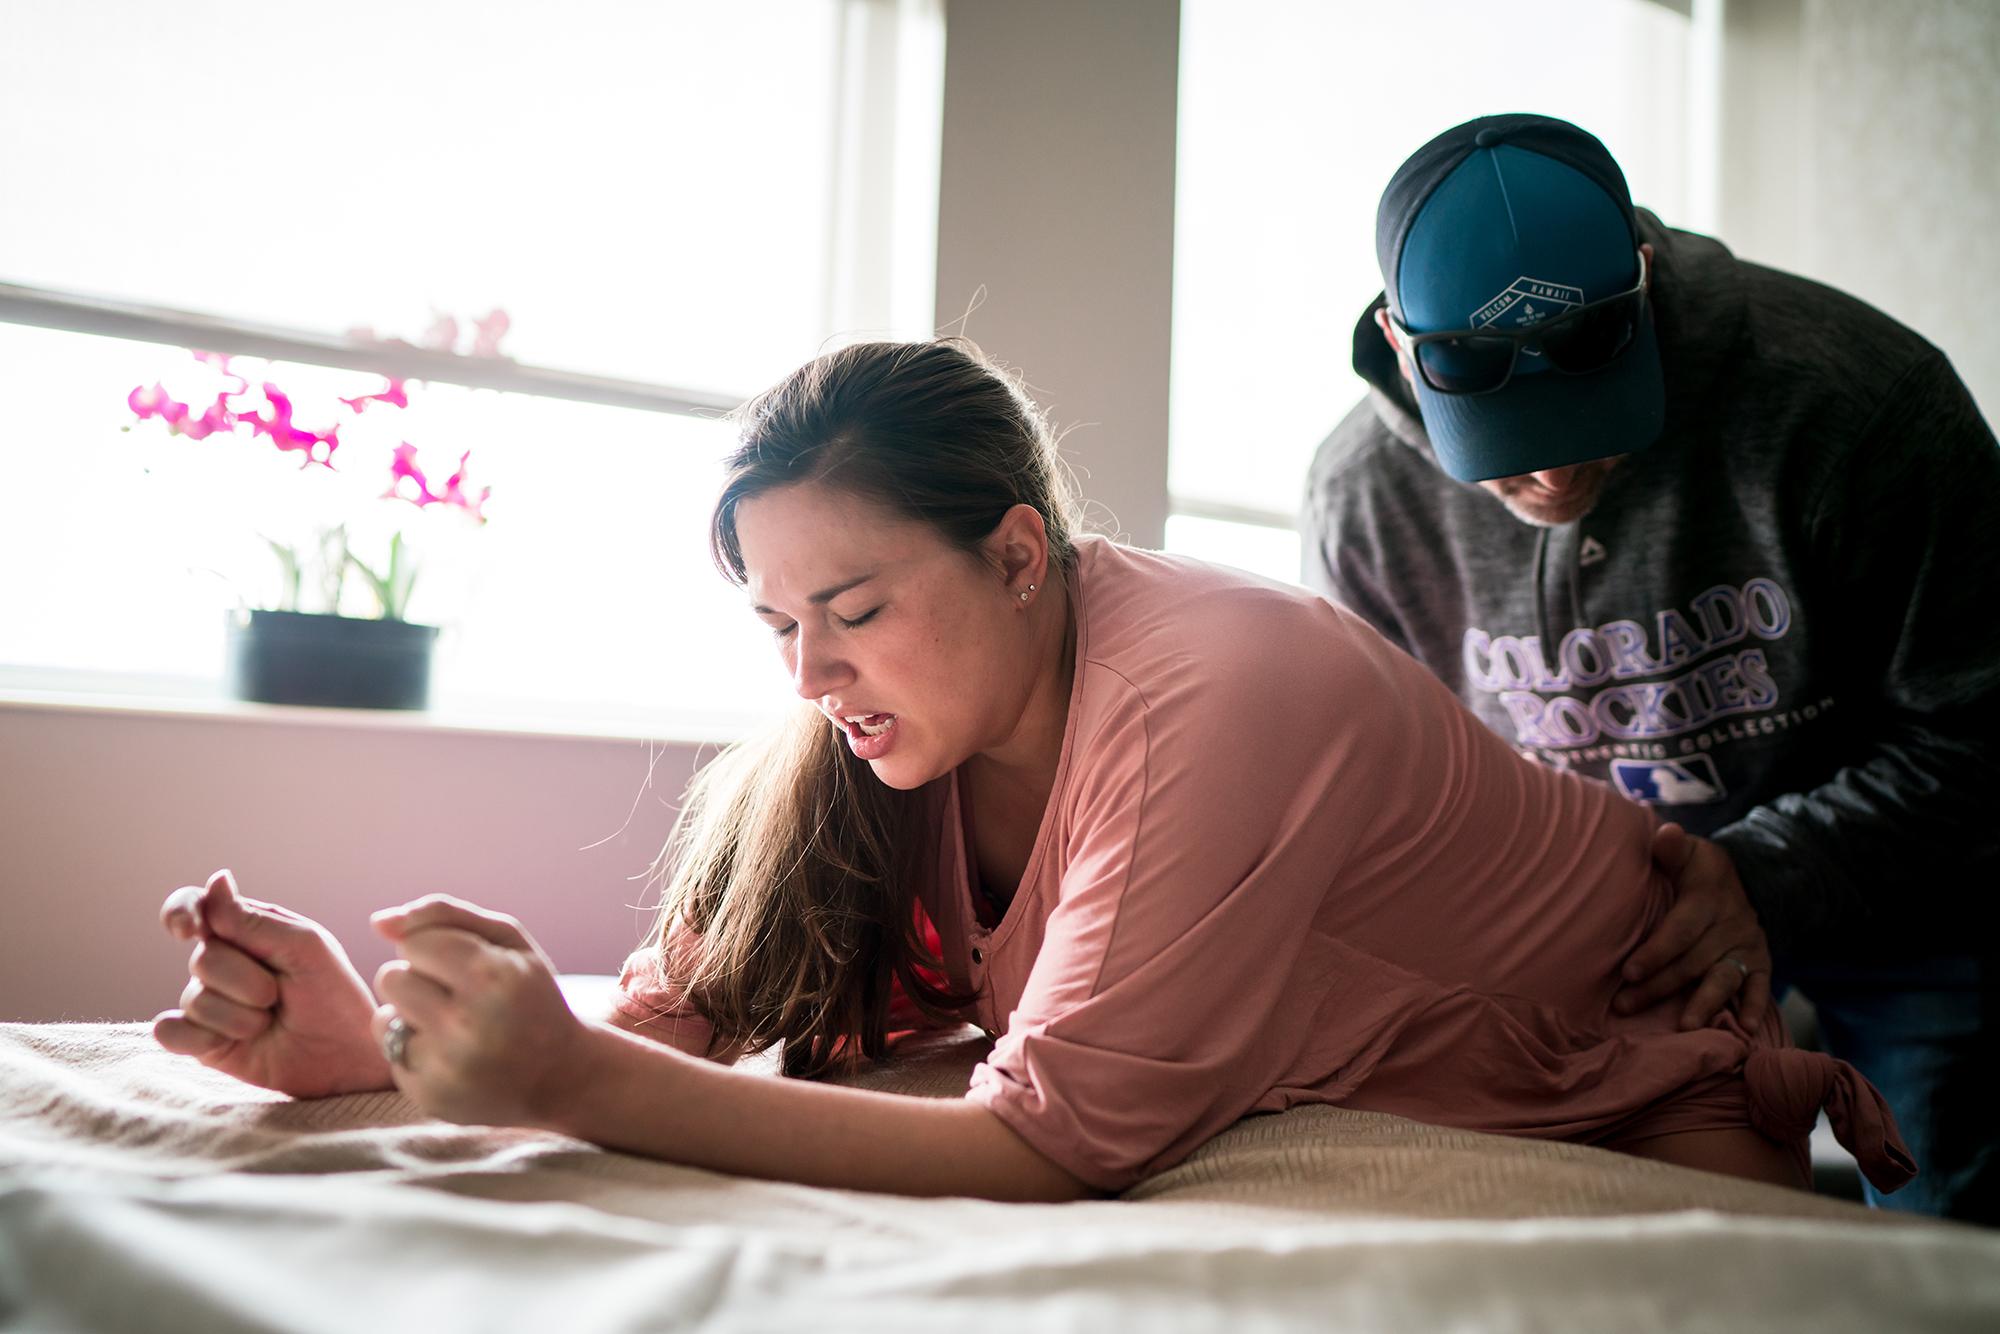 Denver_Colorado_Birth_Eden_Photography_Birth_Center_Brooke-01605-small.jpg